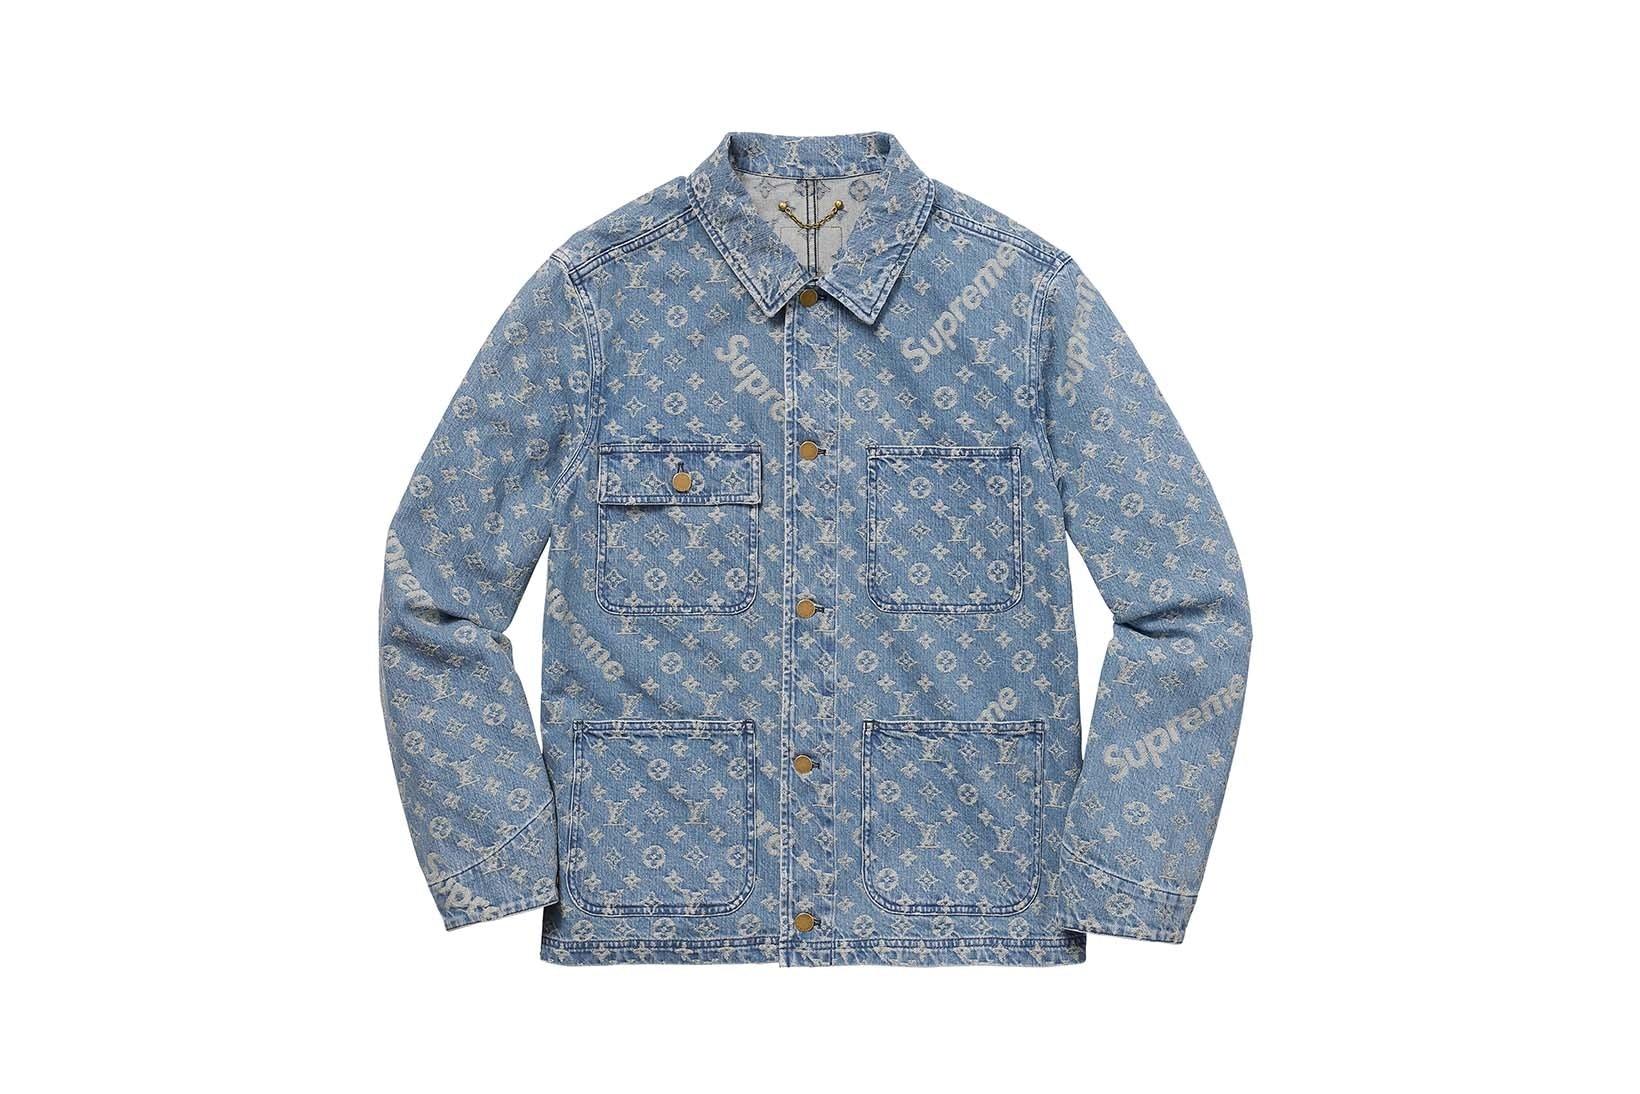 Supreme(シュプリーム)×Louis Vuitton(ルイ・ヴィトン) / ジャカード デニム チョア コート(Jacquard Denim Chore Coat)